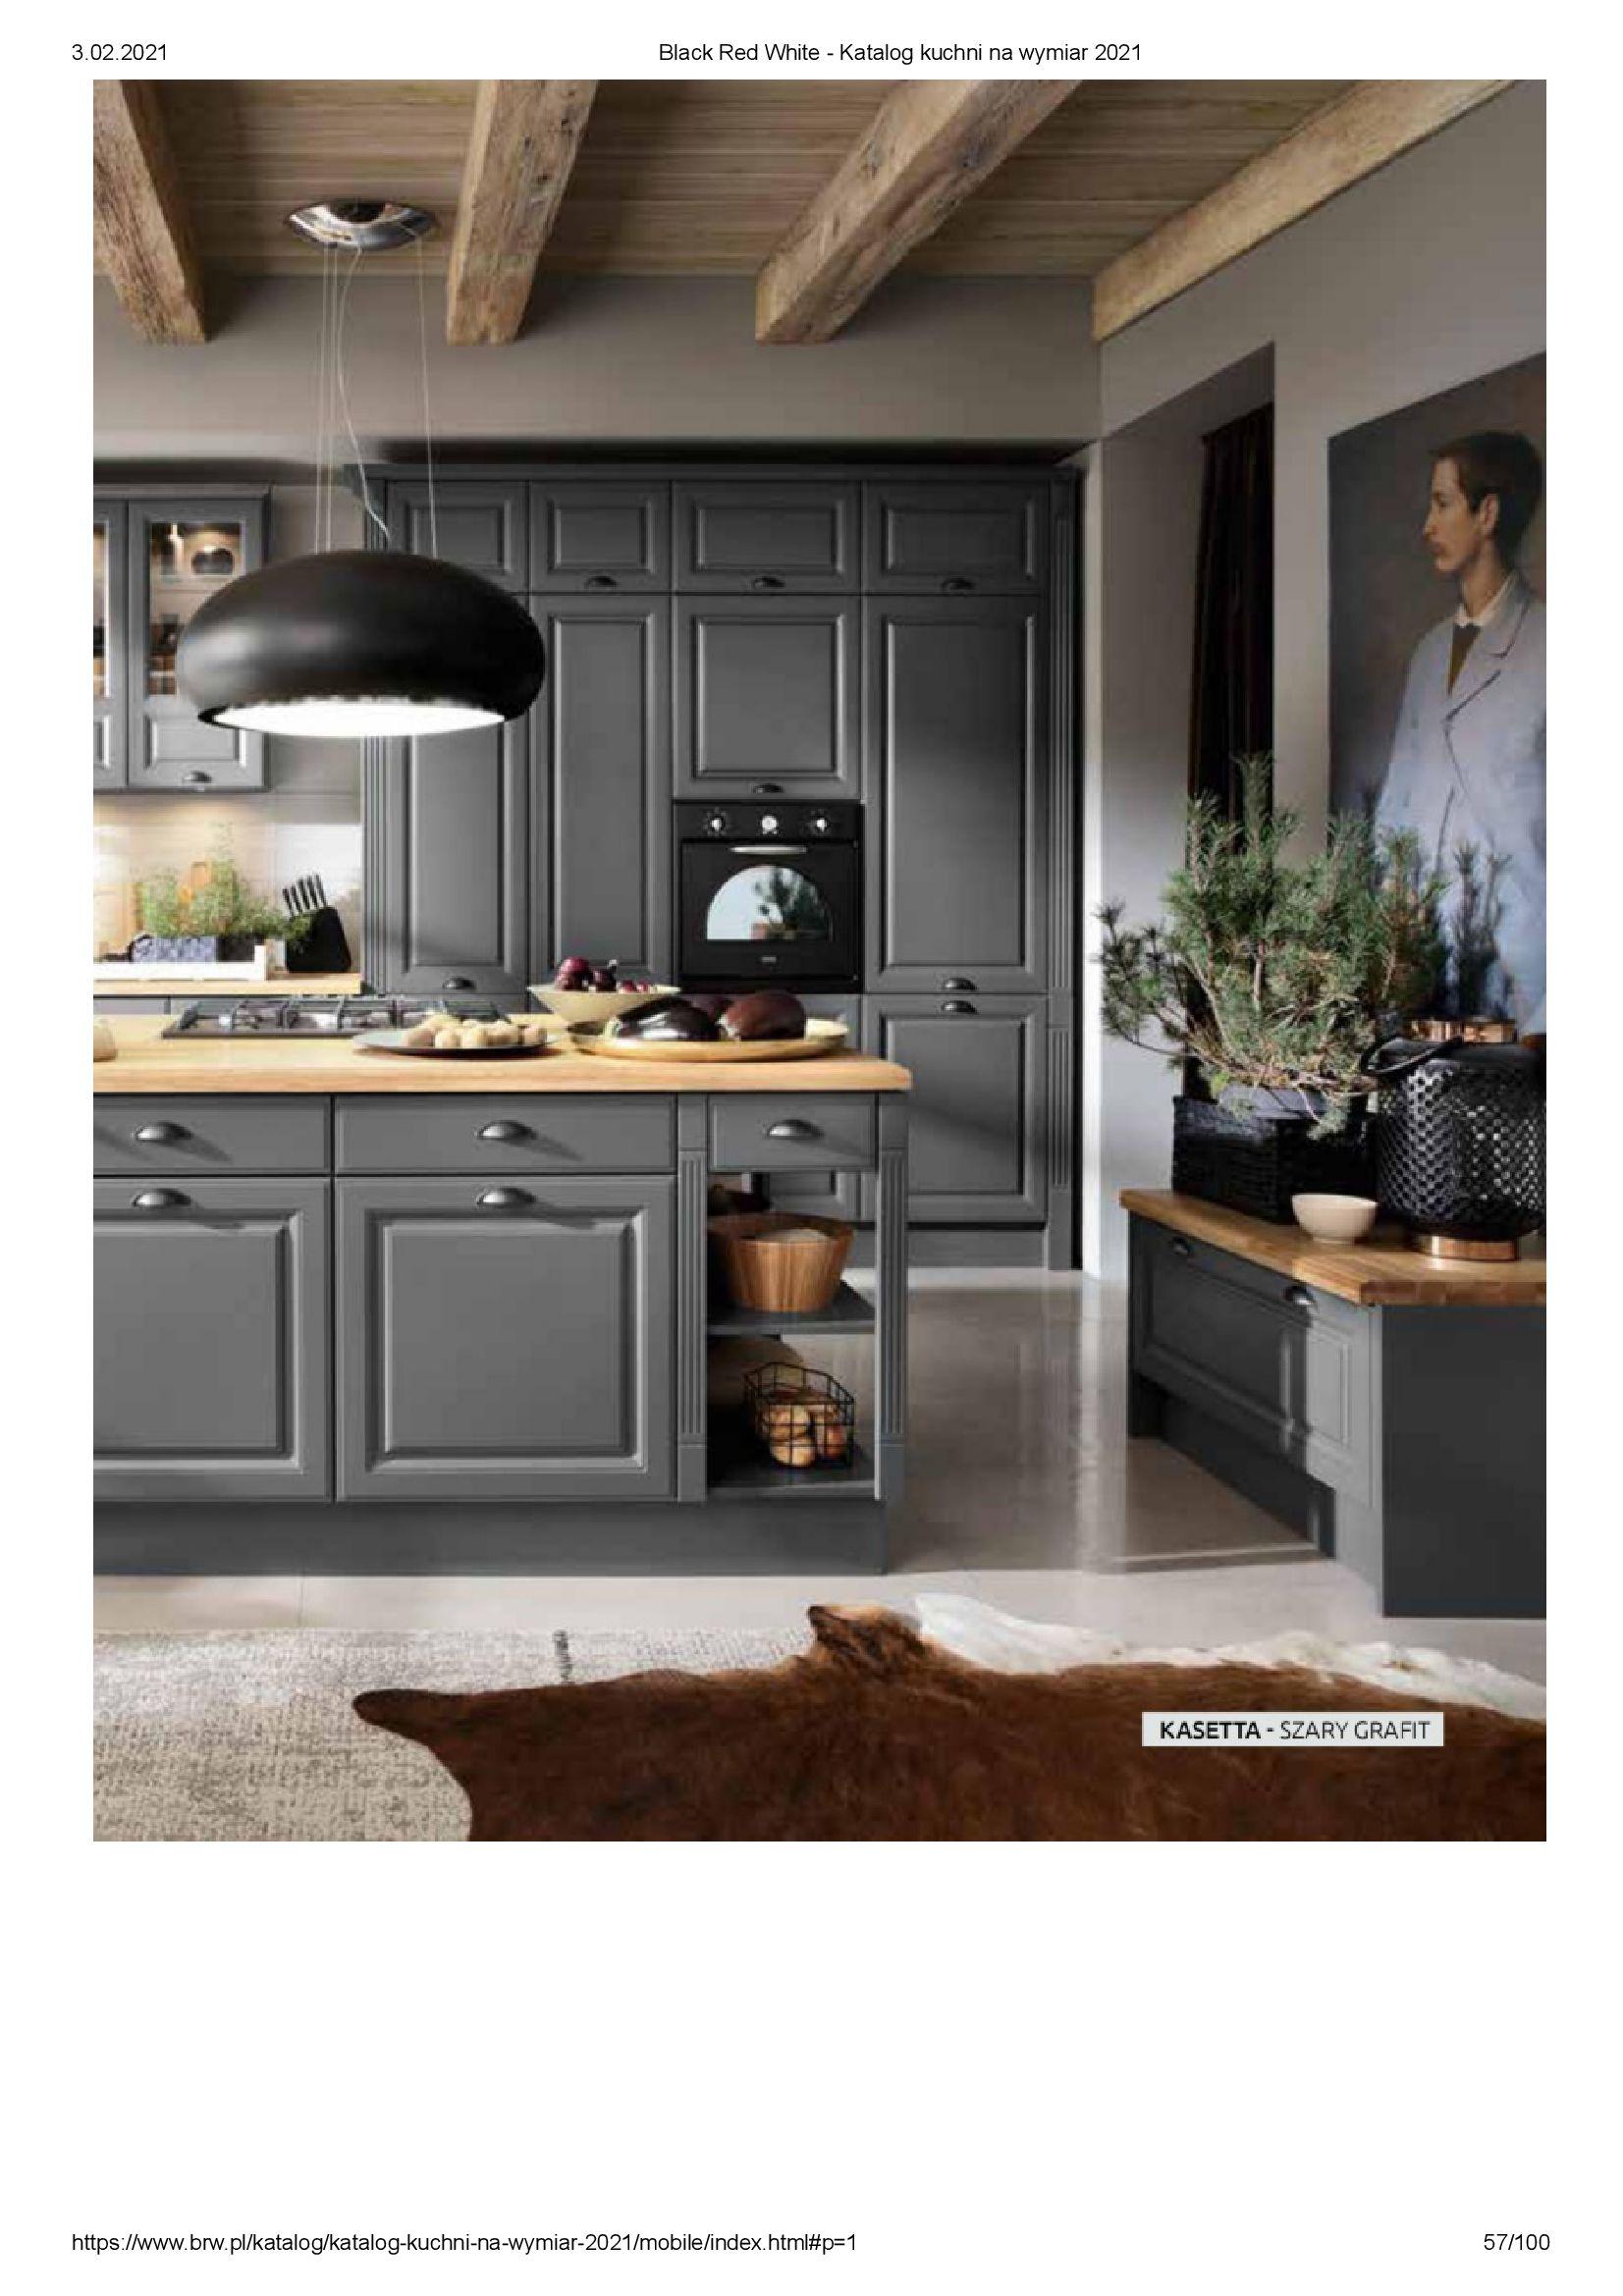 Gazetka Black Red White: Katalog - Kuchnie na wymiar Senso Kitchens 2021 2021-01-01 page-57